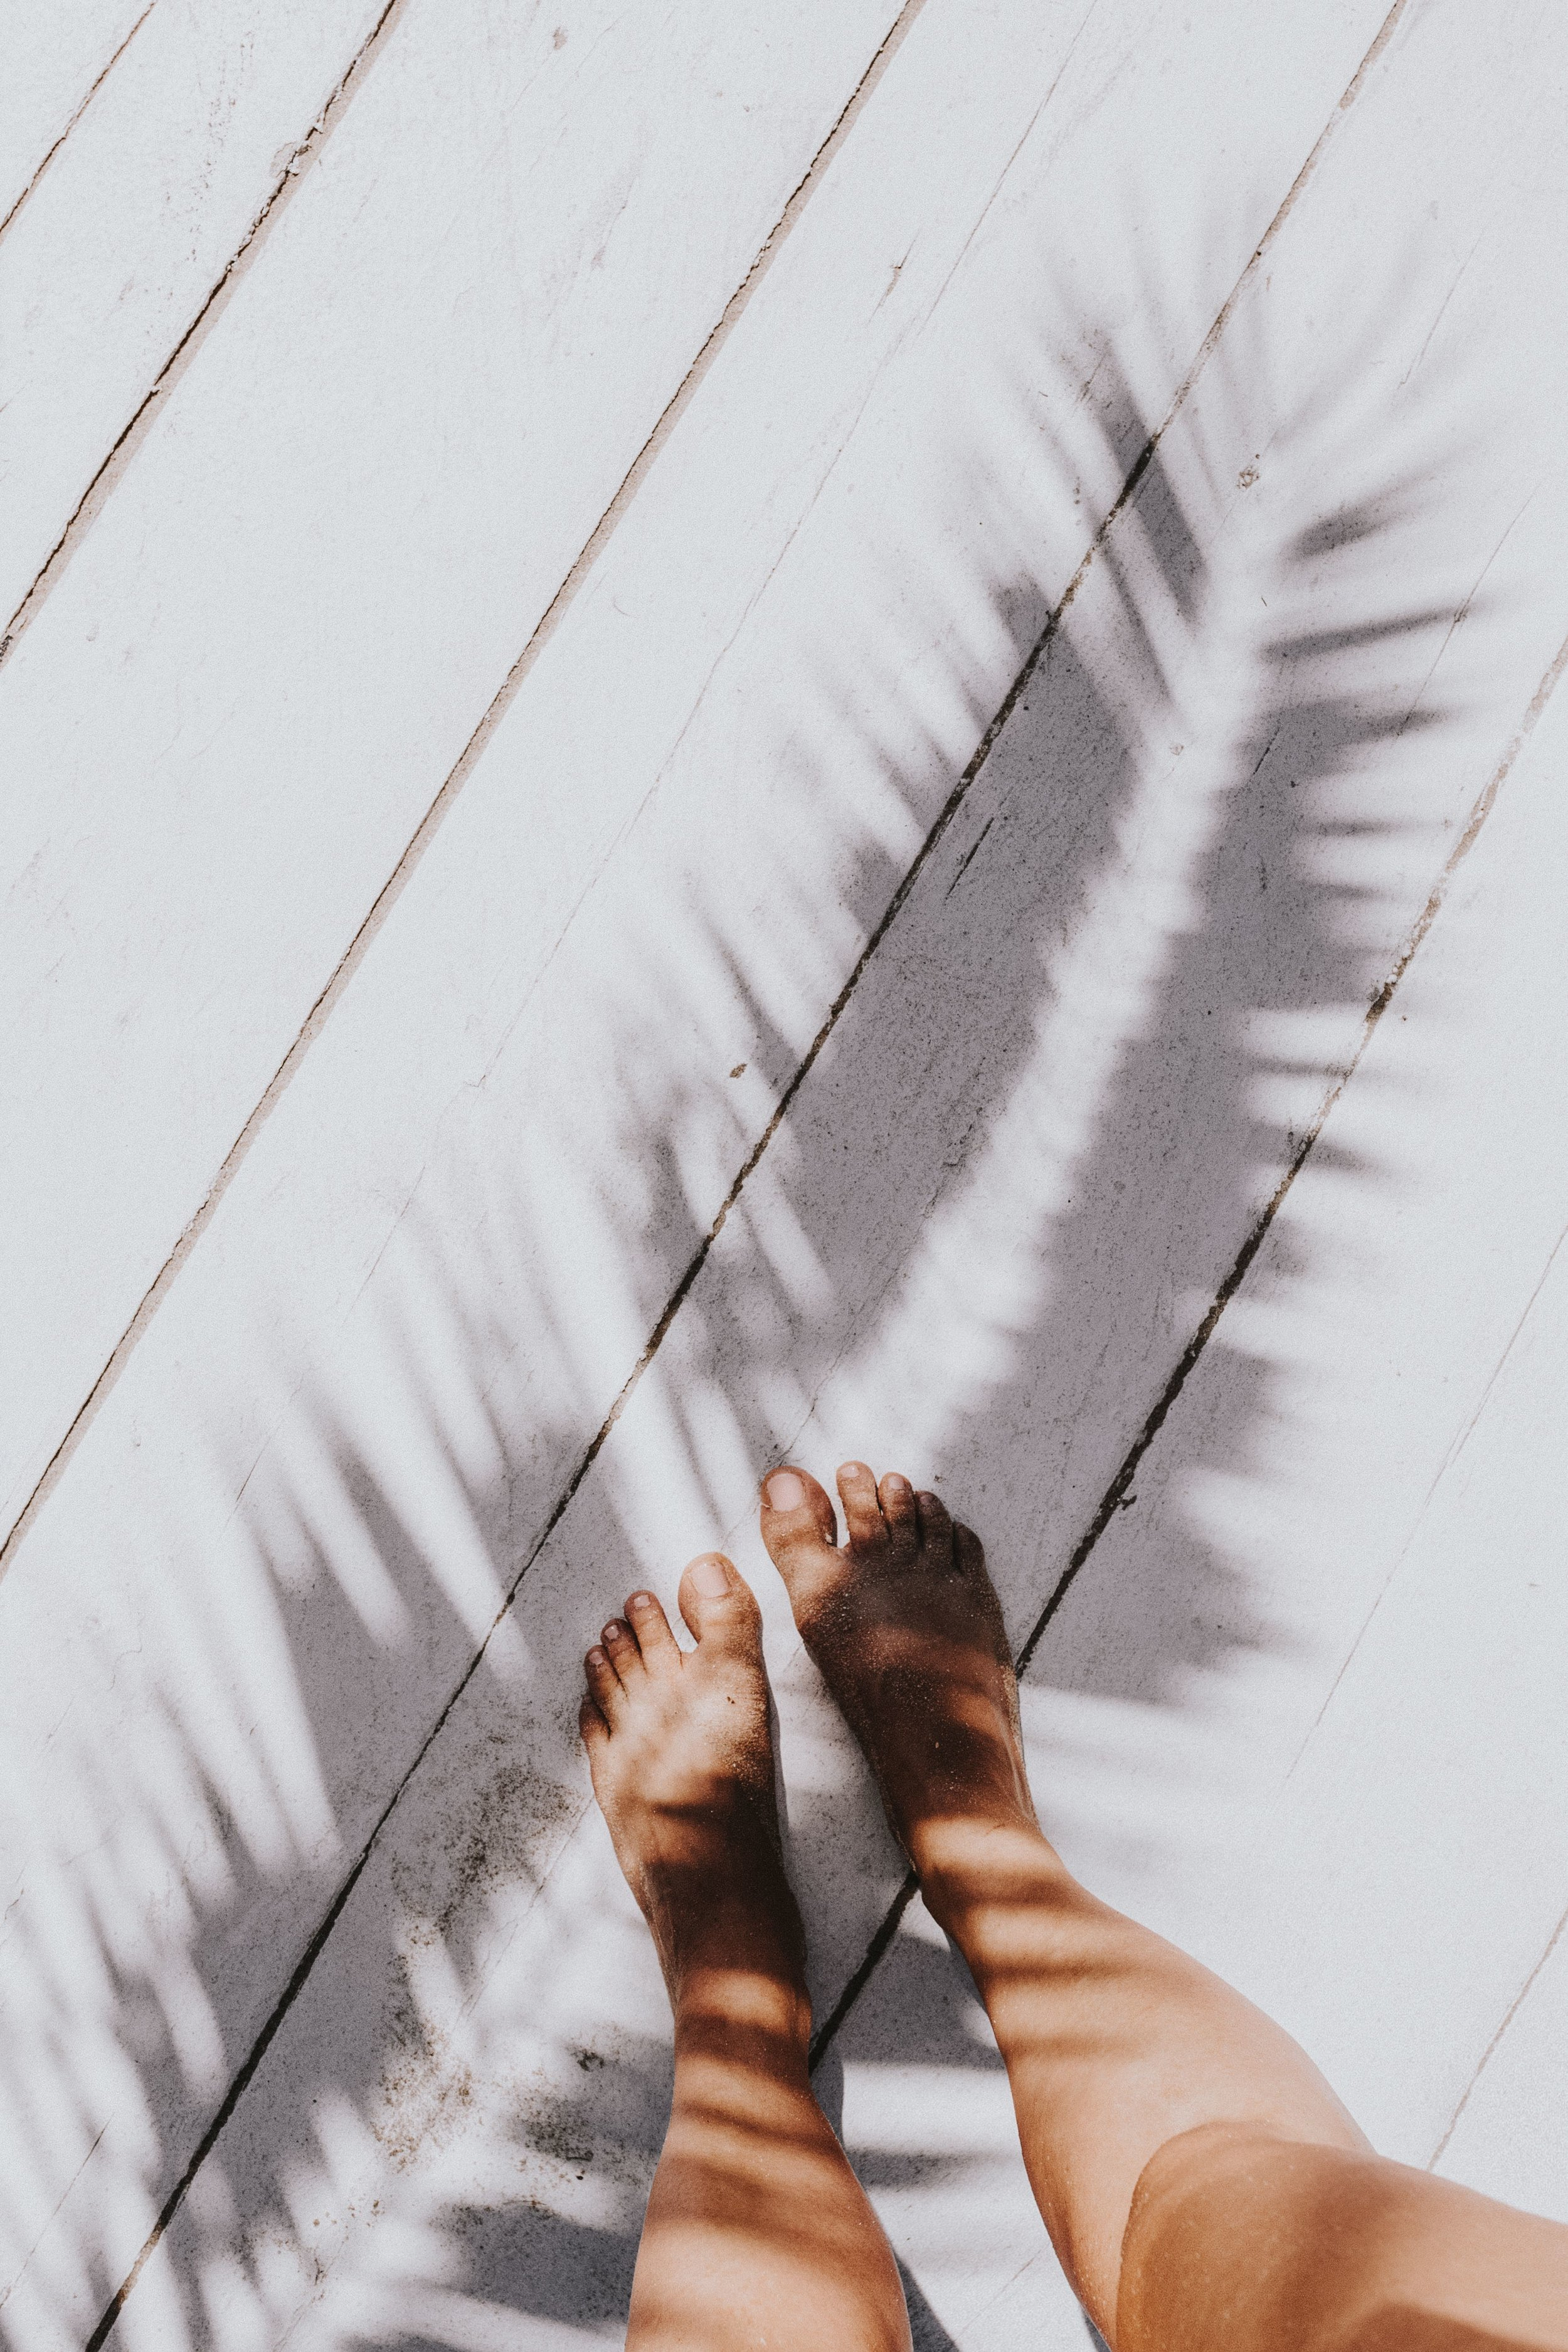 kaboompics_Woman's legs with palm shadow.jpg